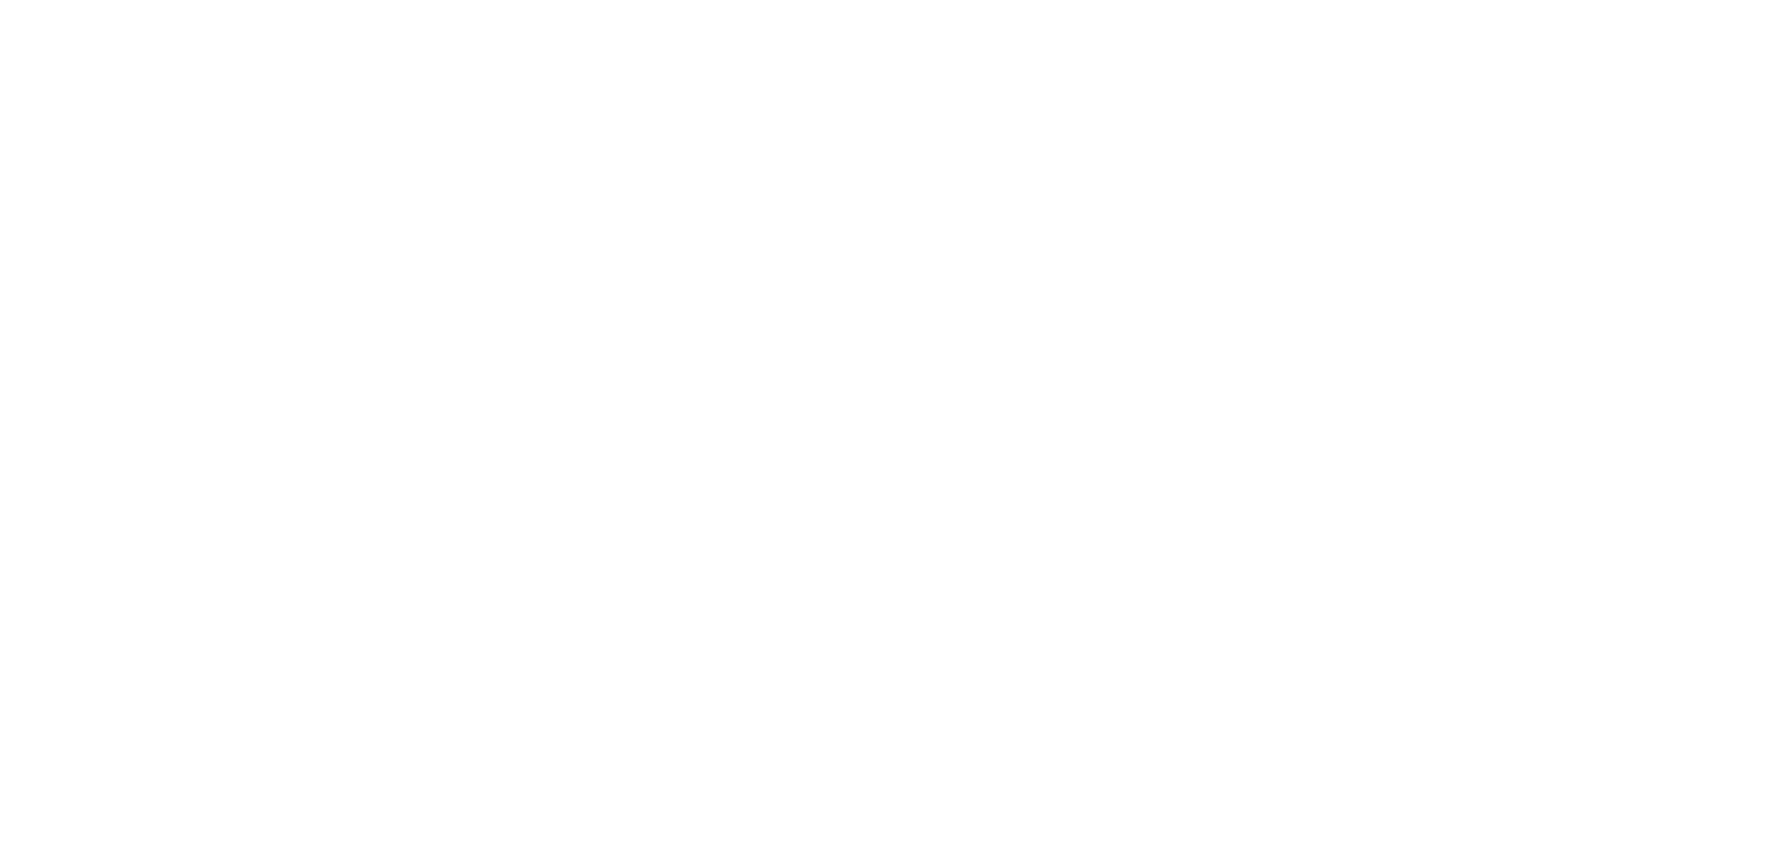 McPeake Town Planning